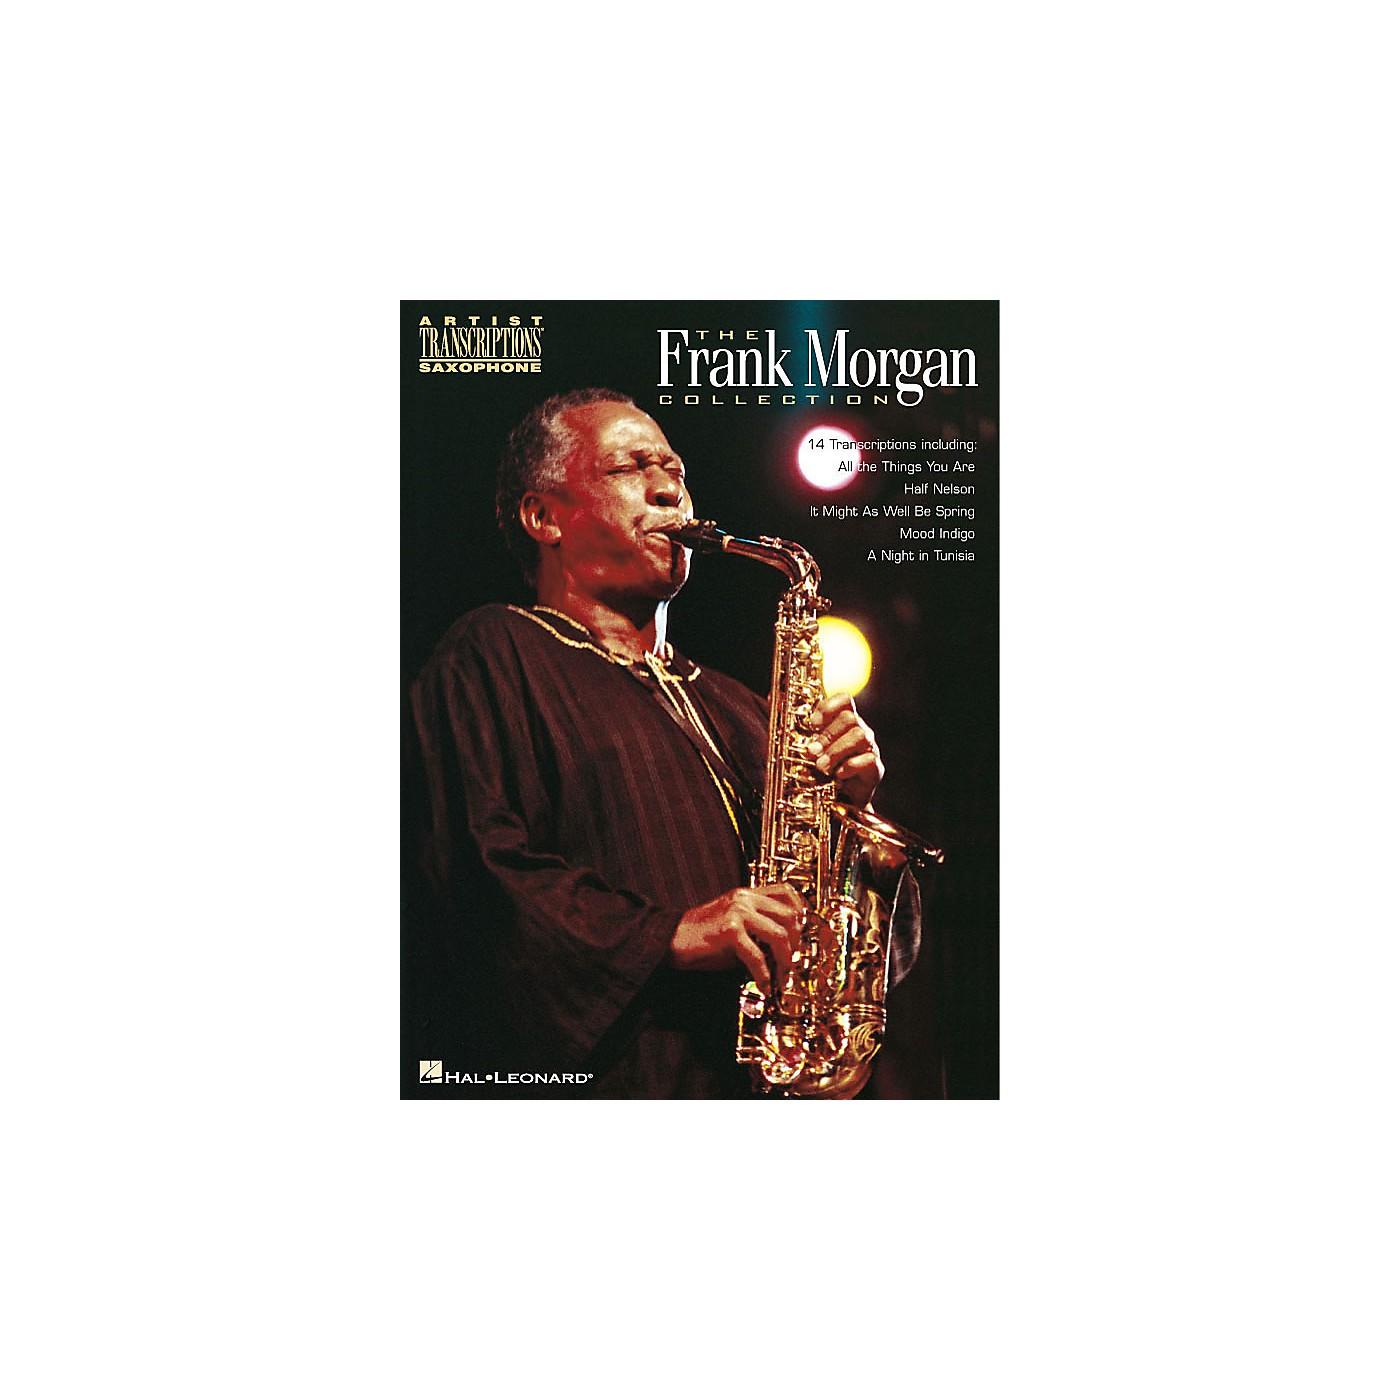 Hal Leonard The Frank Morgan Collection Artist Transcriptions Series Performed by Frank Morgan thumbnail